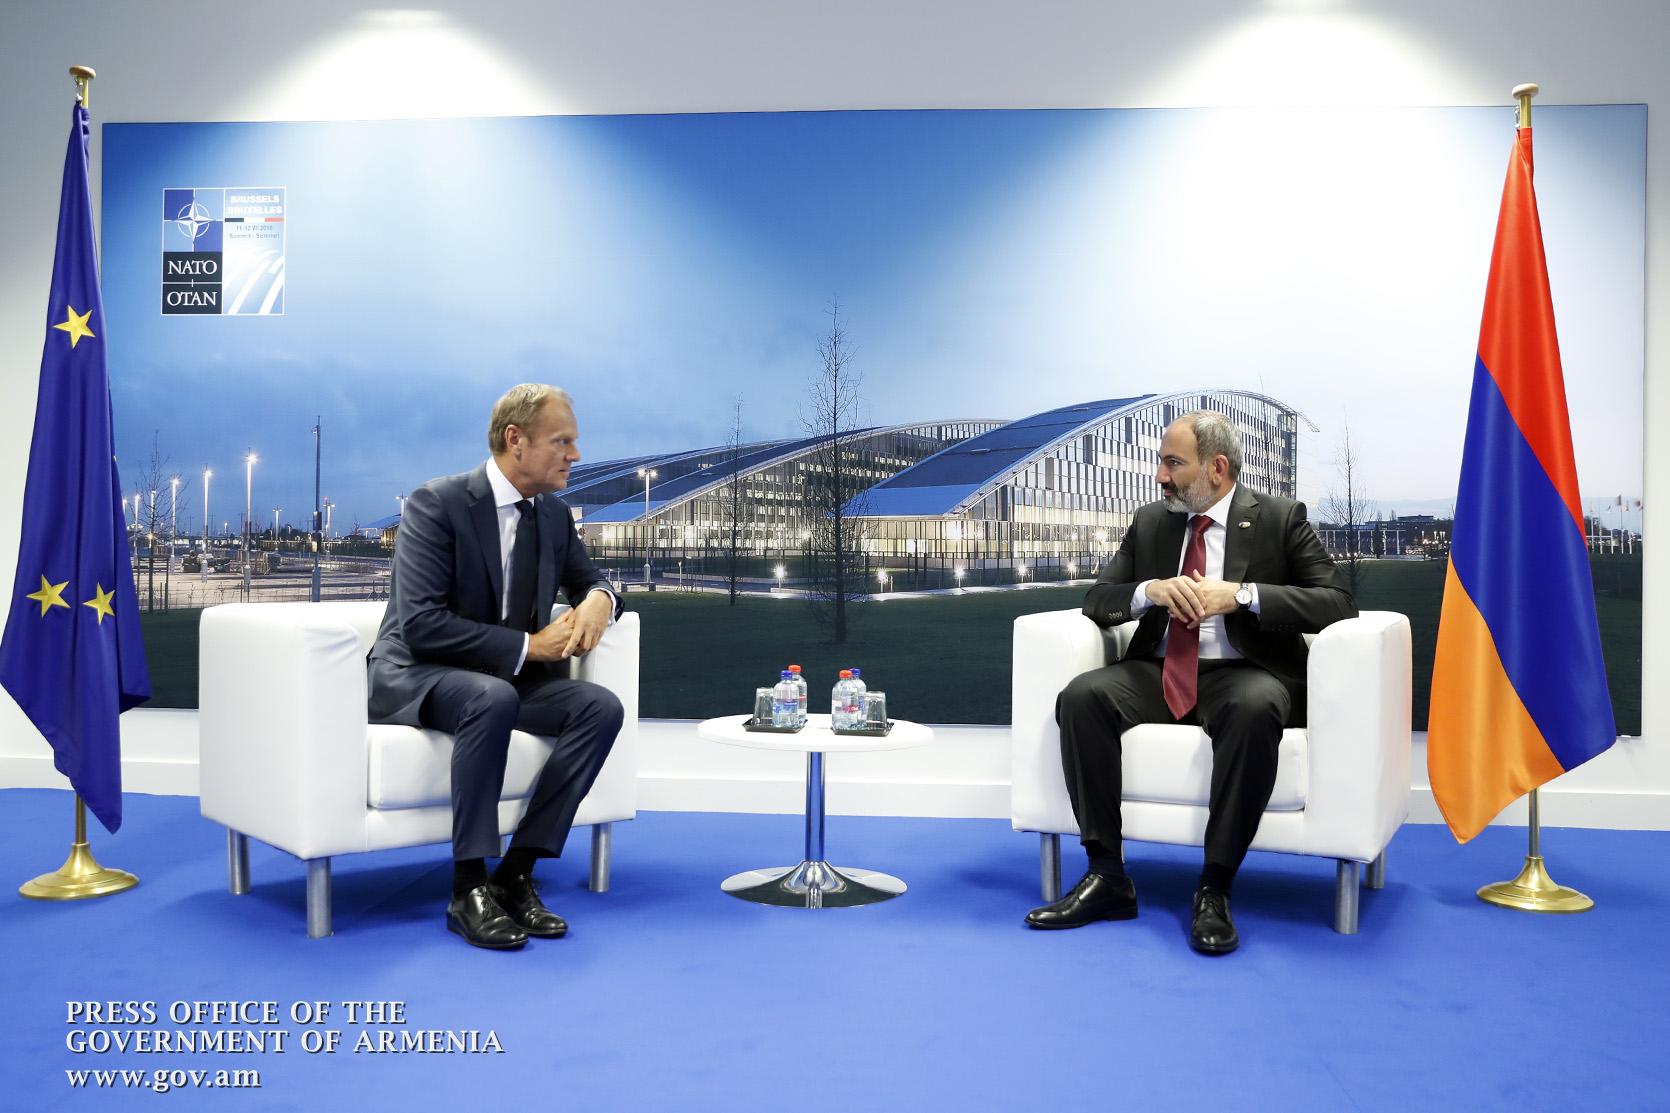 Photo of Կարող եք ակնկալել ԵՄ աջակցությունը բարեփոխումները կյանքի կոչելու ճանապարհին. Դոնալդ Տուսկը՝ Նիկոլ Փաշինյանին